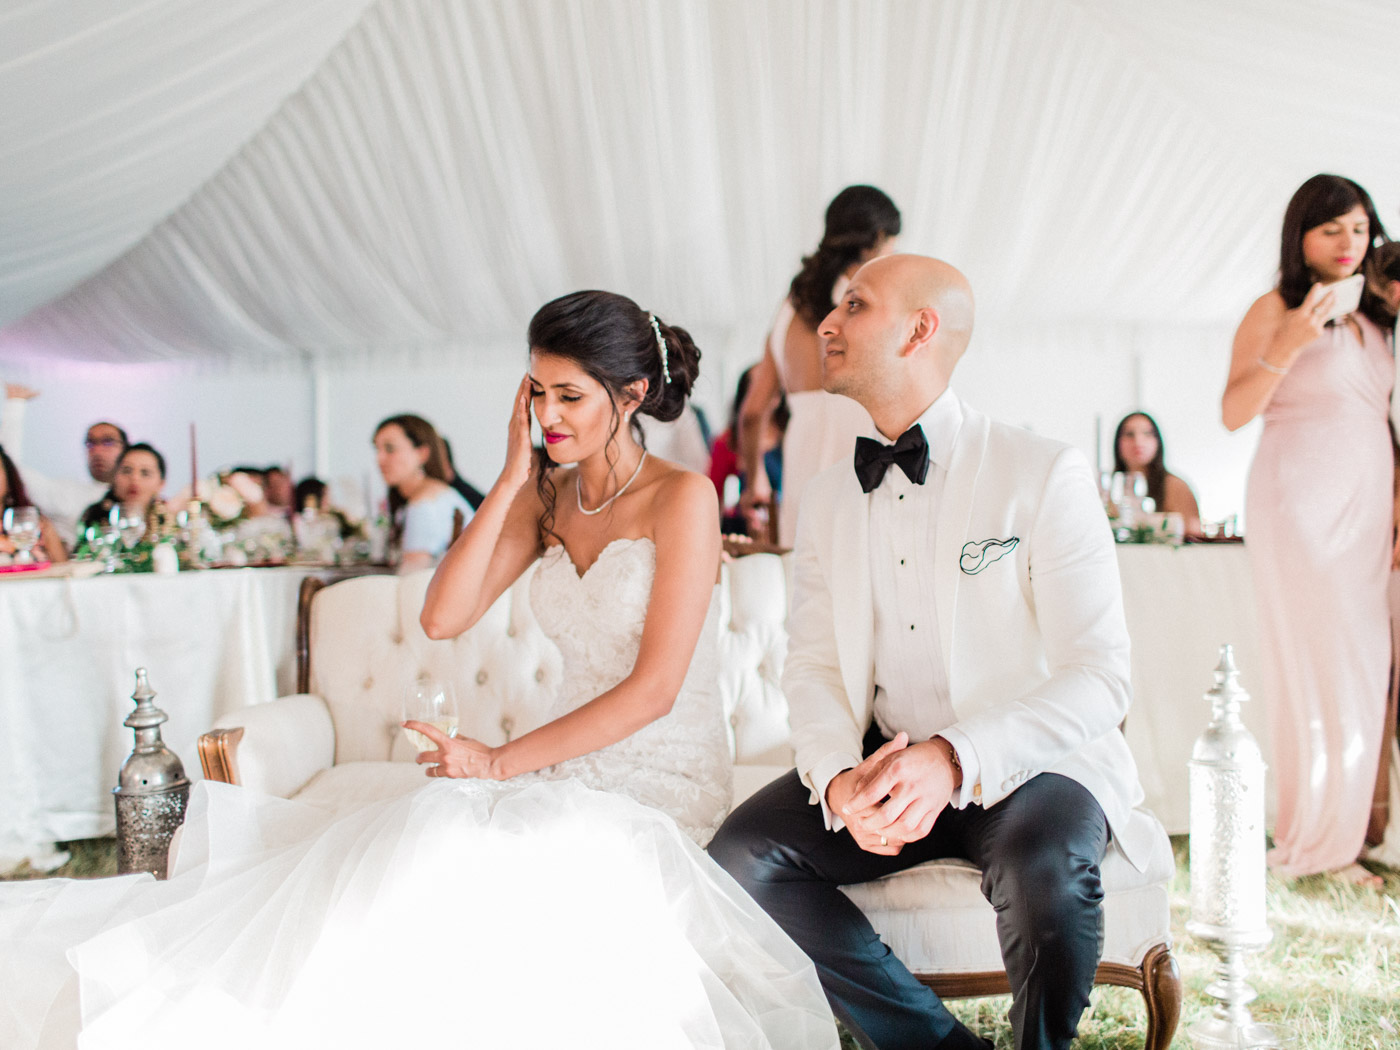 Toronto-Collingwood-wedding-photographer-indian-wedding-documentary164.jpg